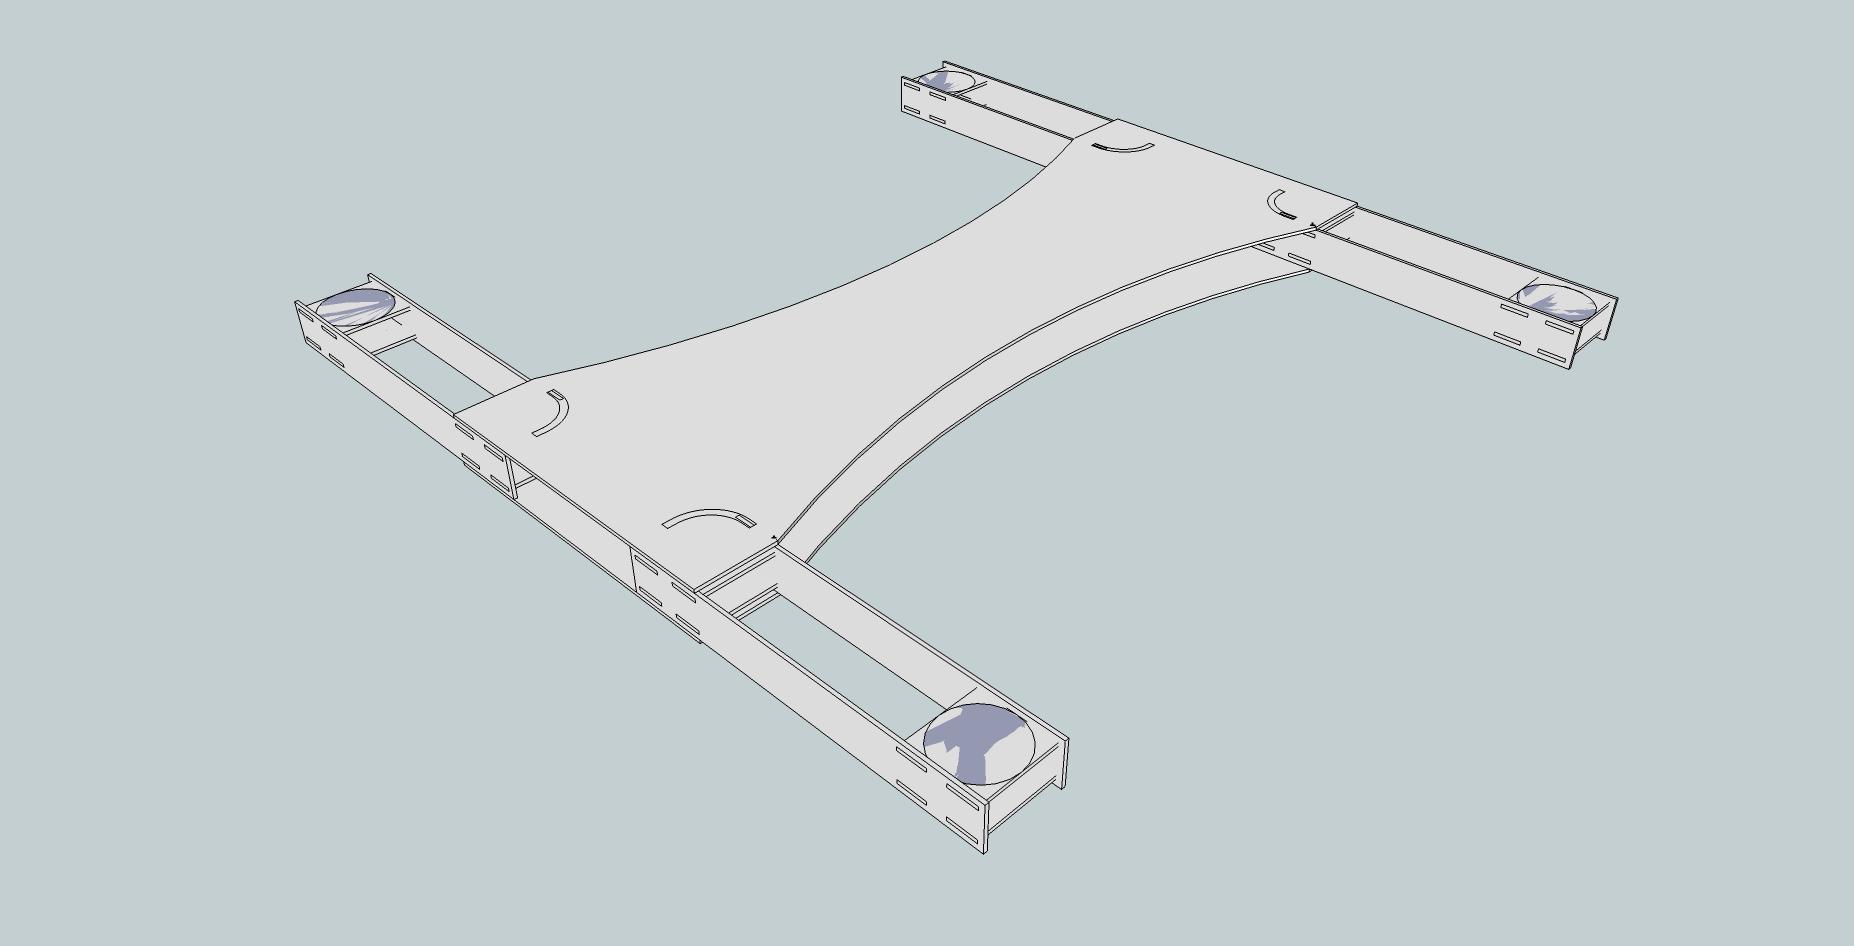 My OpenSource Quadcopter design - Build Log - DroneTrest